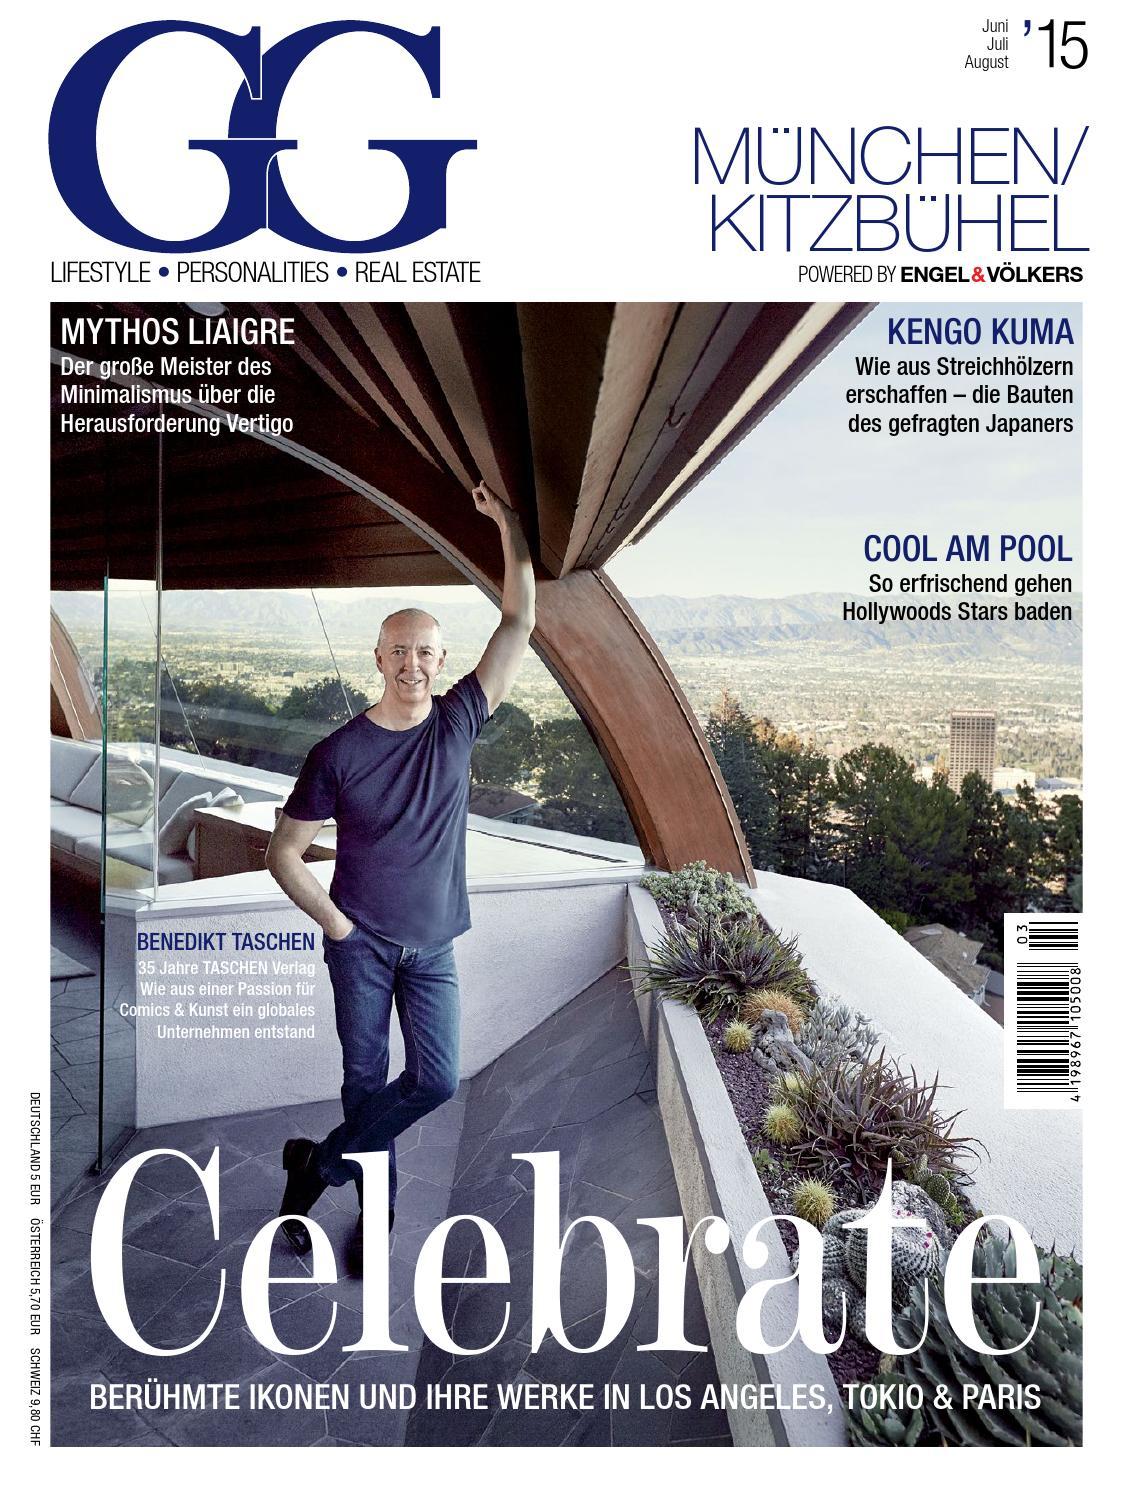 GG Magazine 03/2015 München/Kitzbühel by GG-Magazine - issuu